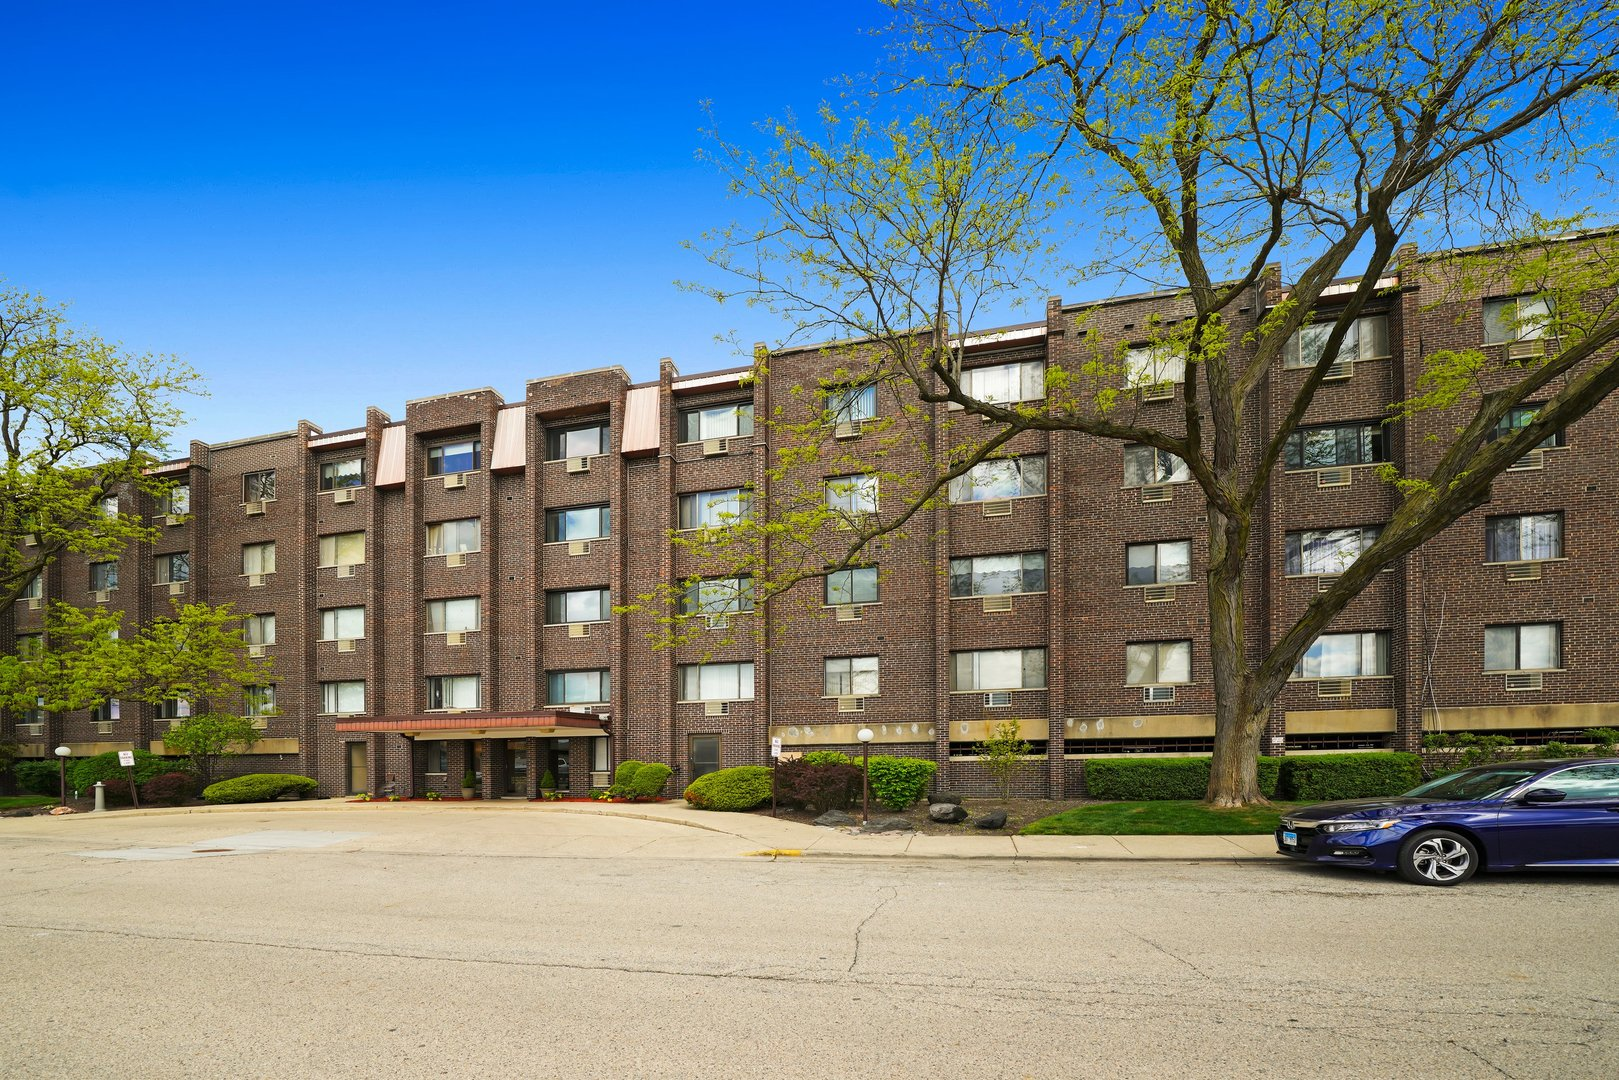 4623 Chester Unit Unit 113 ,Chicago, Illinois 60656